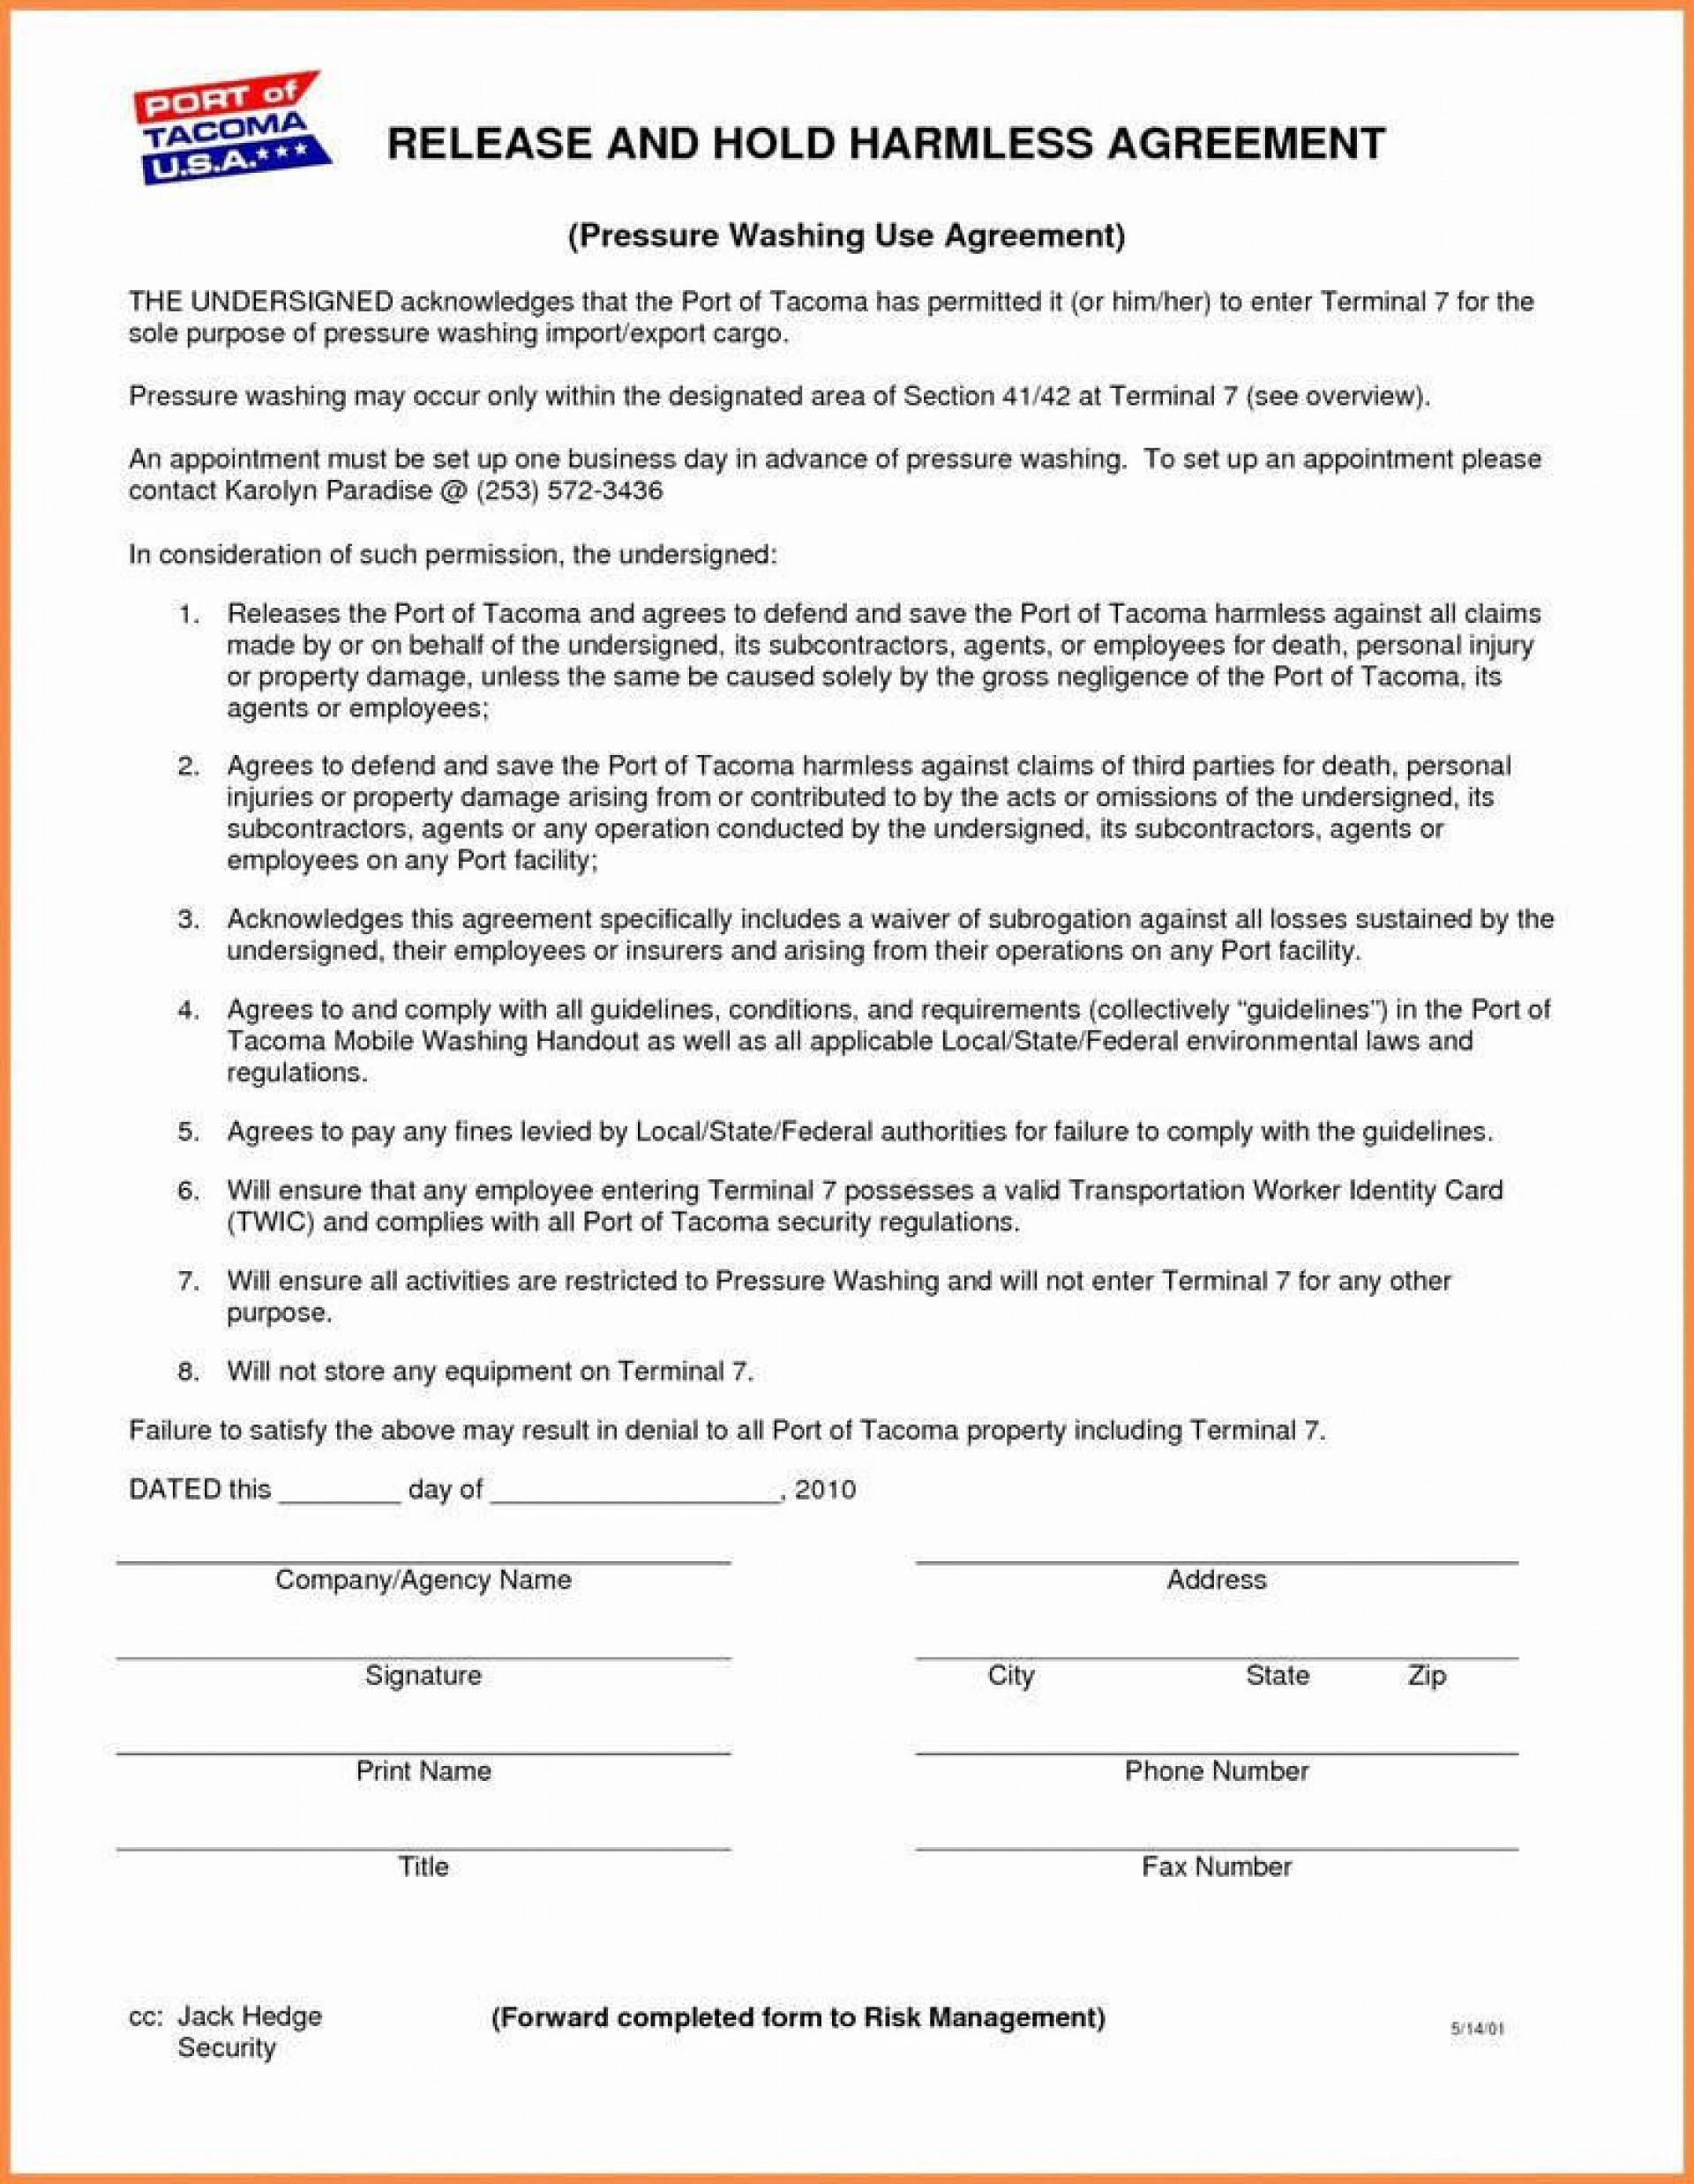 009 Shocking Operation Agreement Llc Template Example  Operating Florida Indiana Single Member California1920